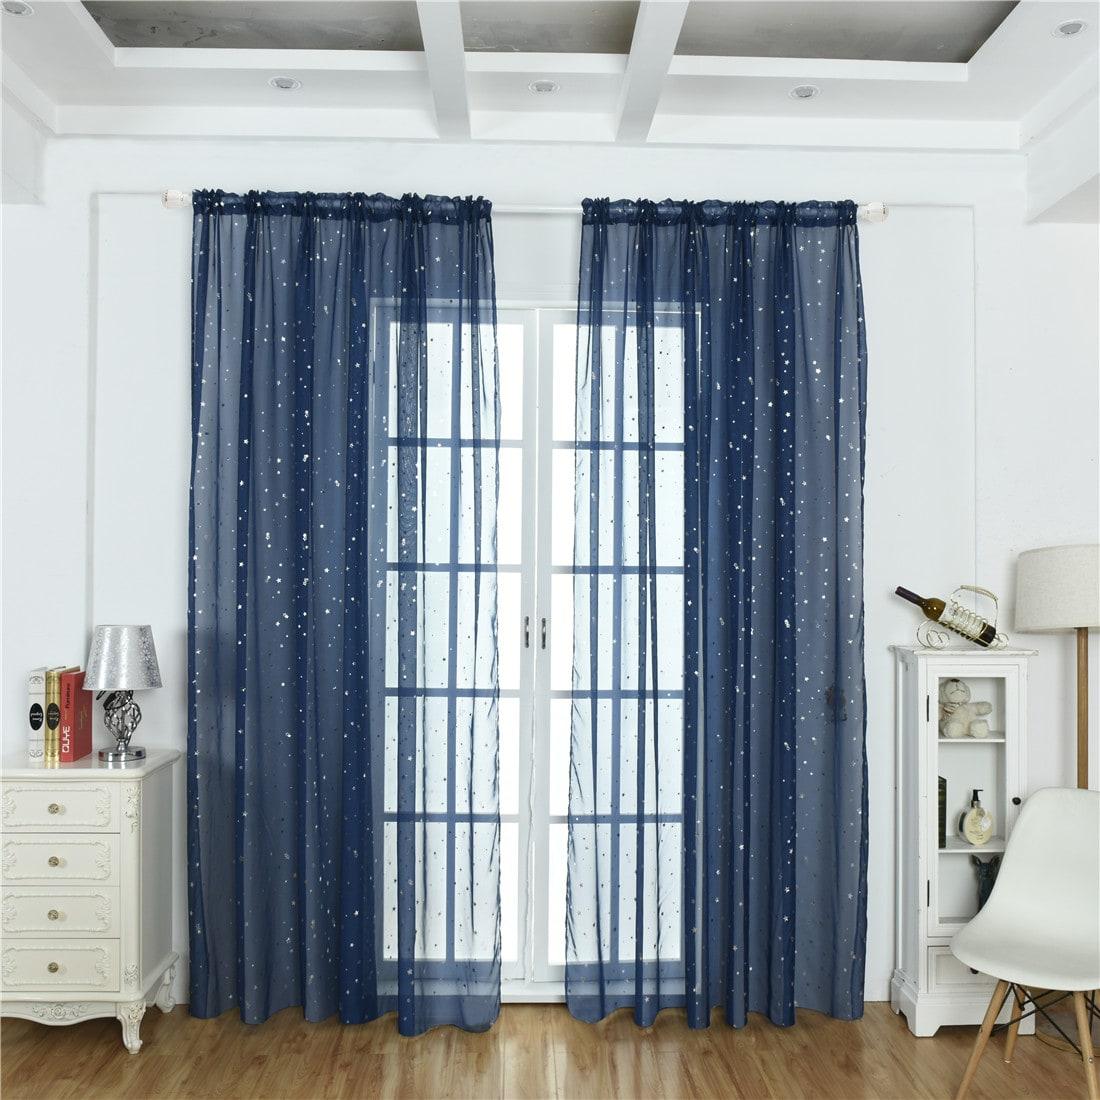 Star Decor Rod Pocket Sheer Curtain 1pc